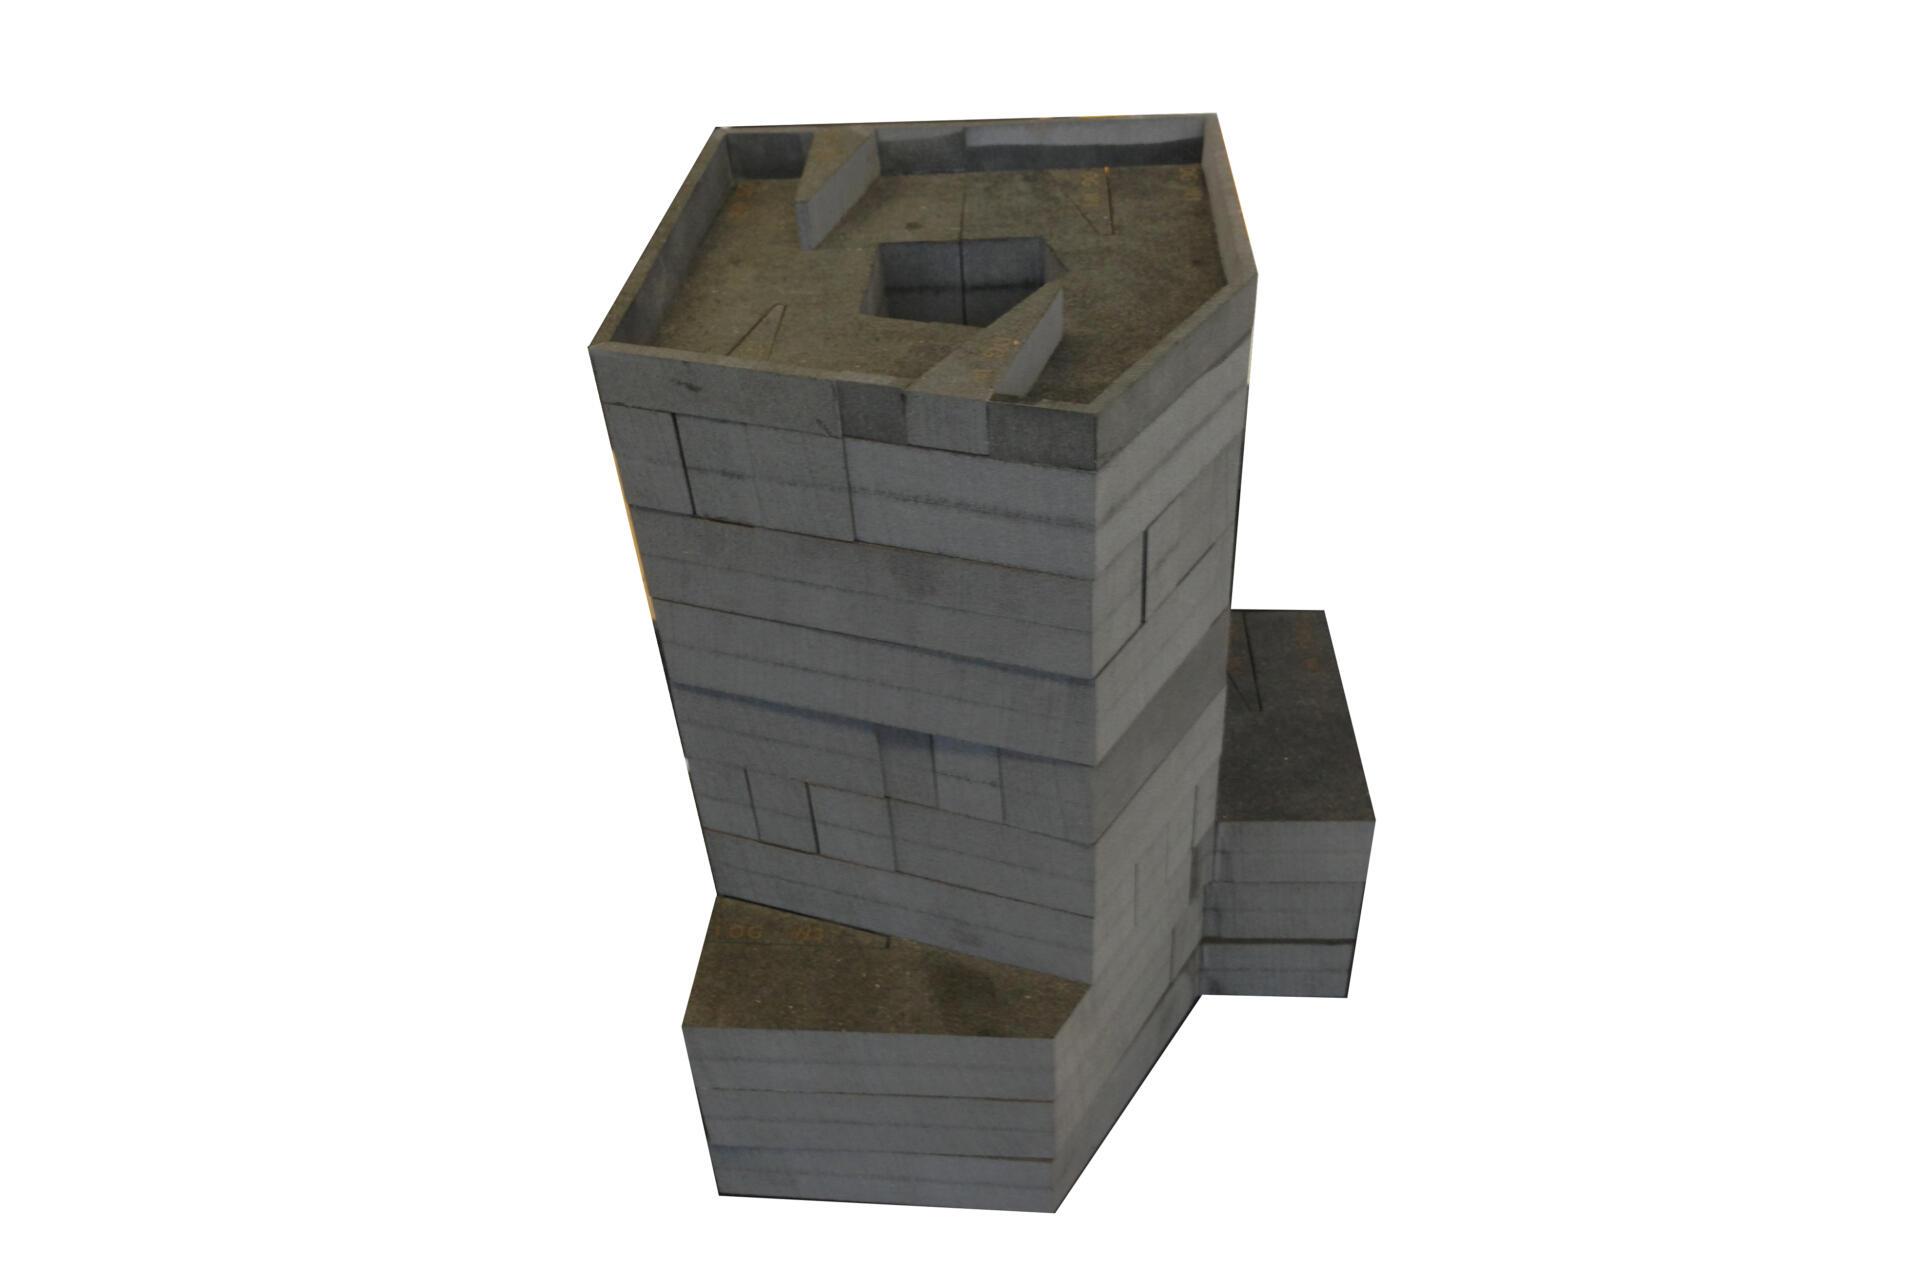 Wohnhaus 6